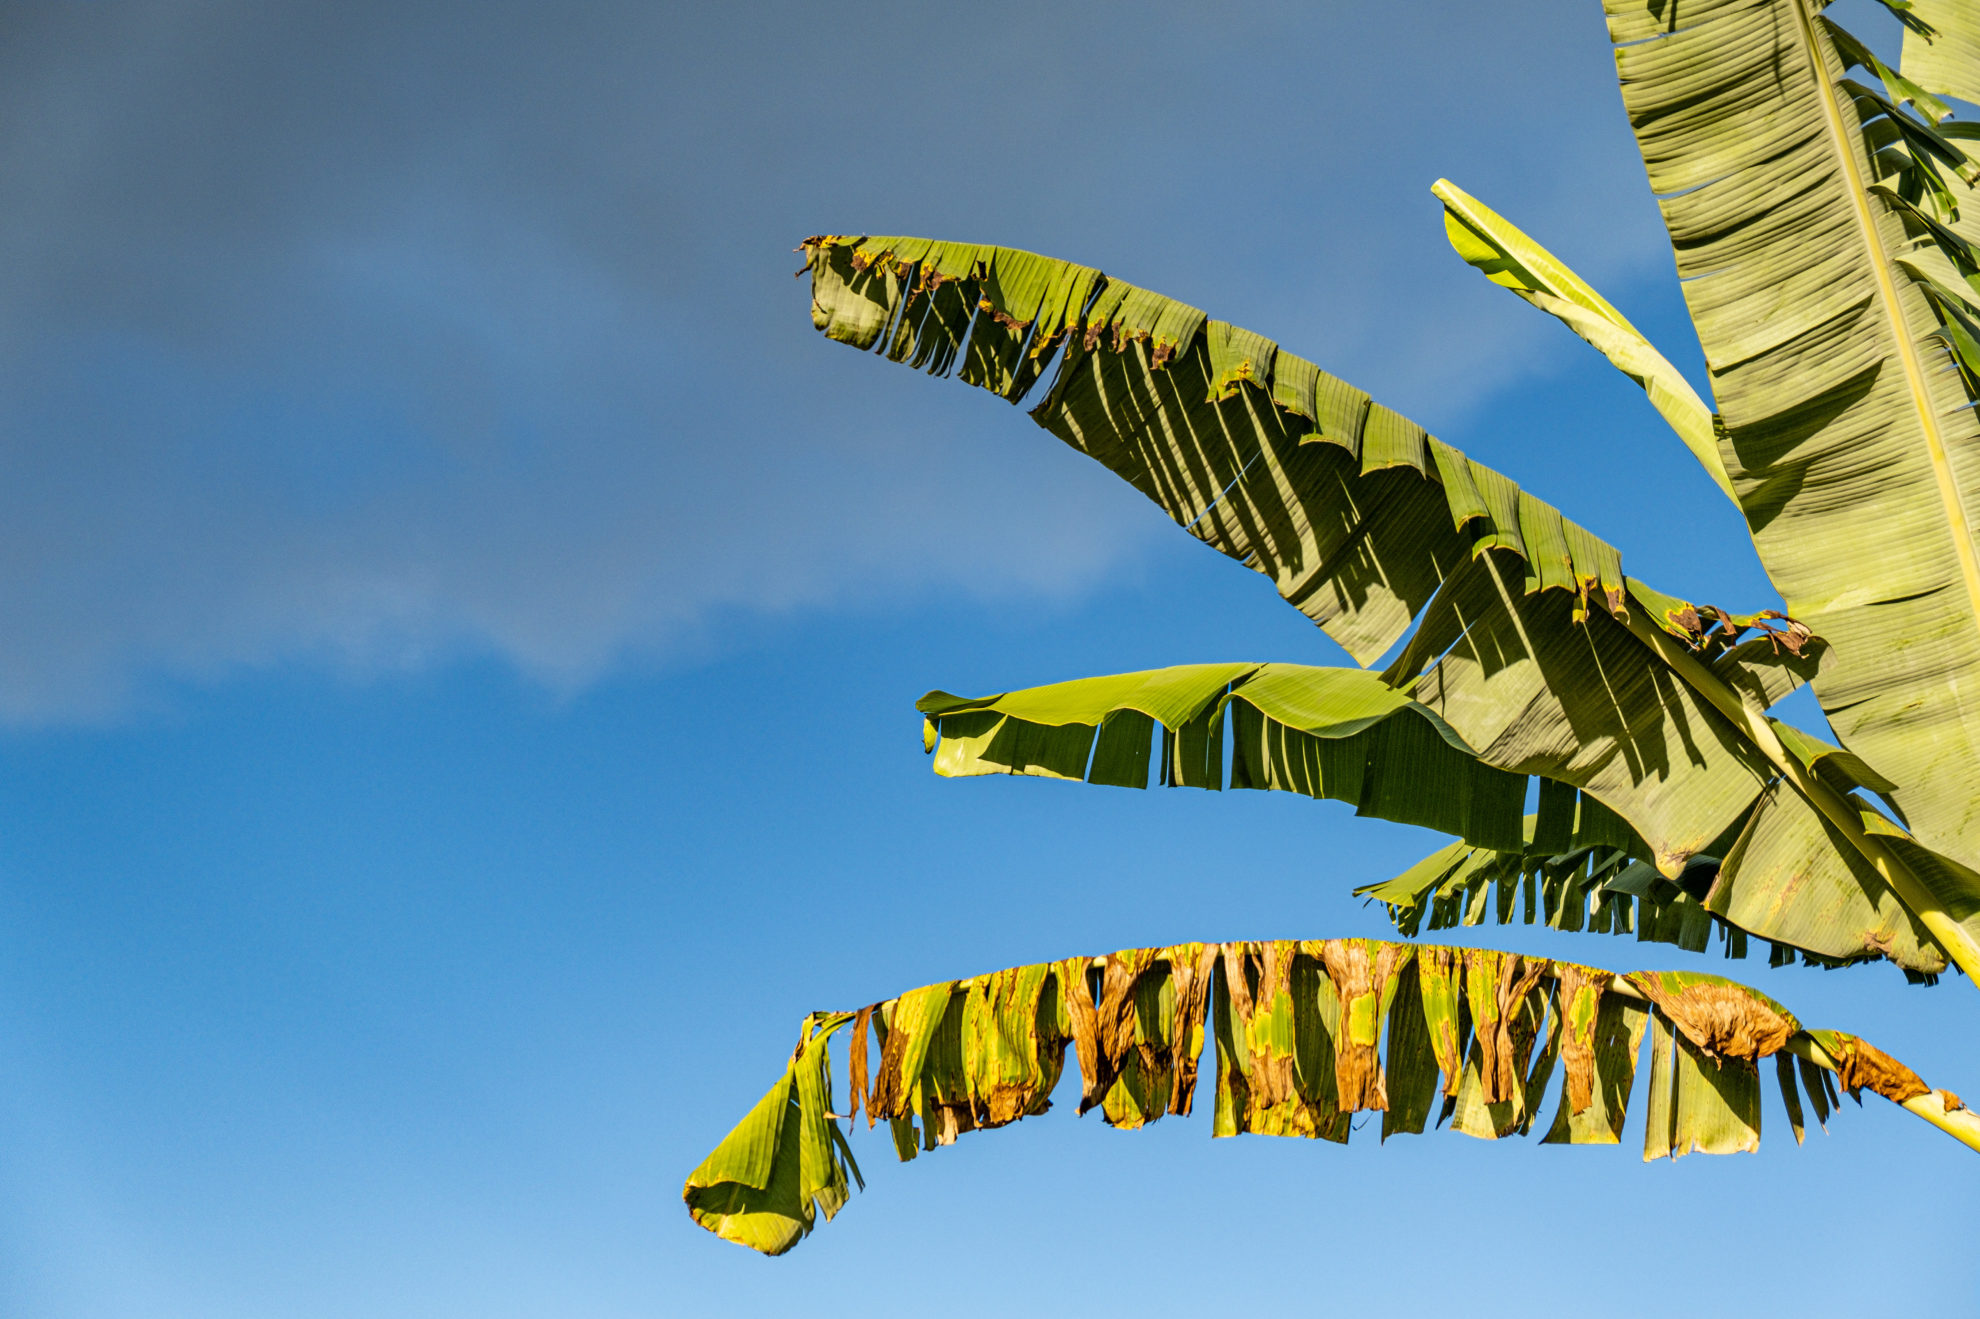 Mehrere Palmblätter vor blauem Himmel